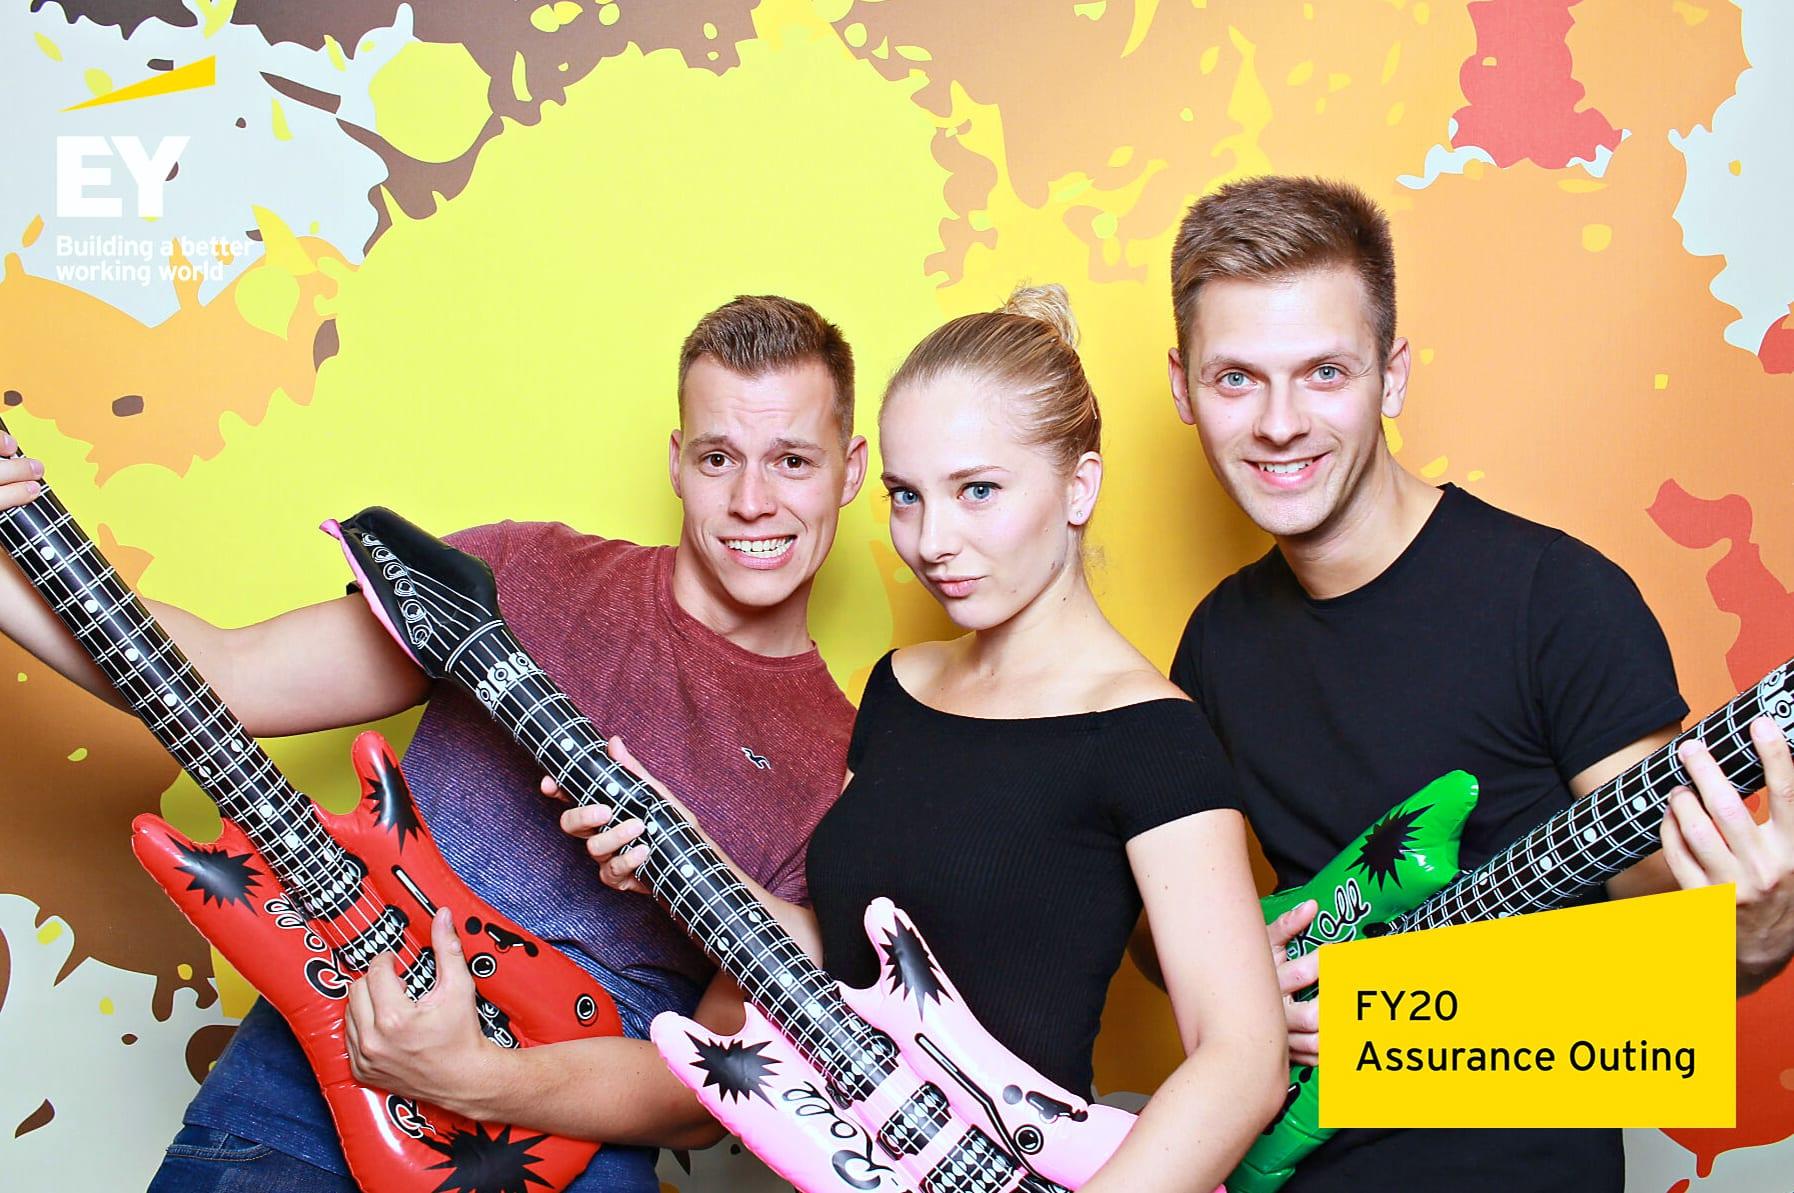 fotokoutek-firemni-vecirek-plzen-ey-assurance-outing-20-9-2019-655244